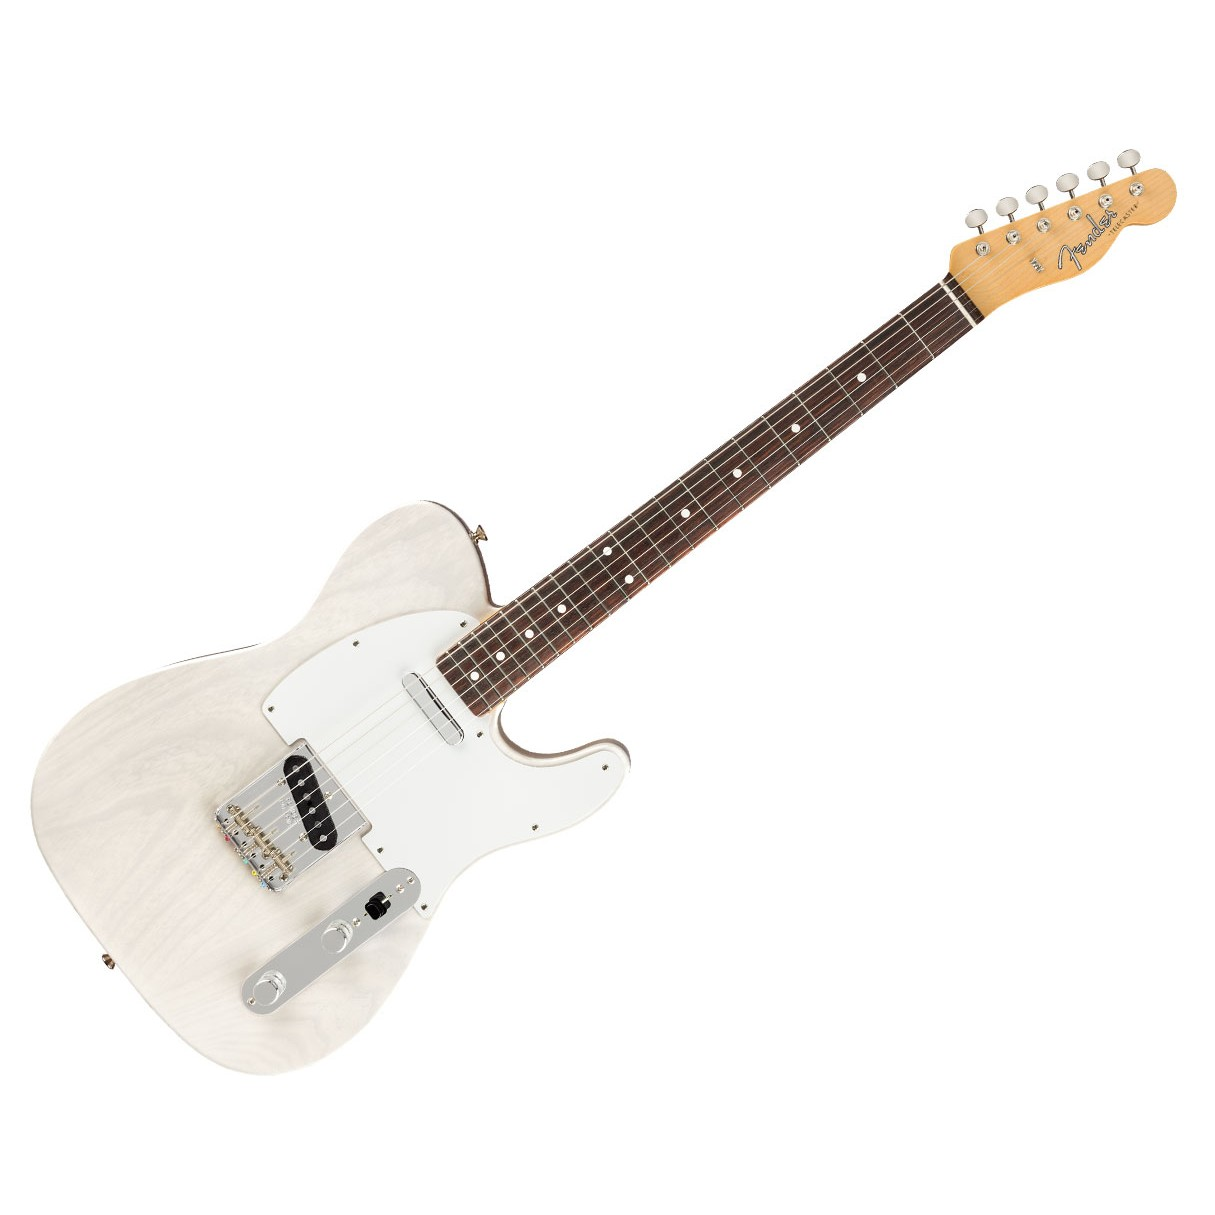 fender jimmy page mirror telecaster white blonde w rosewood fingerboard. Black Bedroom Furniture Sets. Home Design Ideas